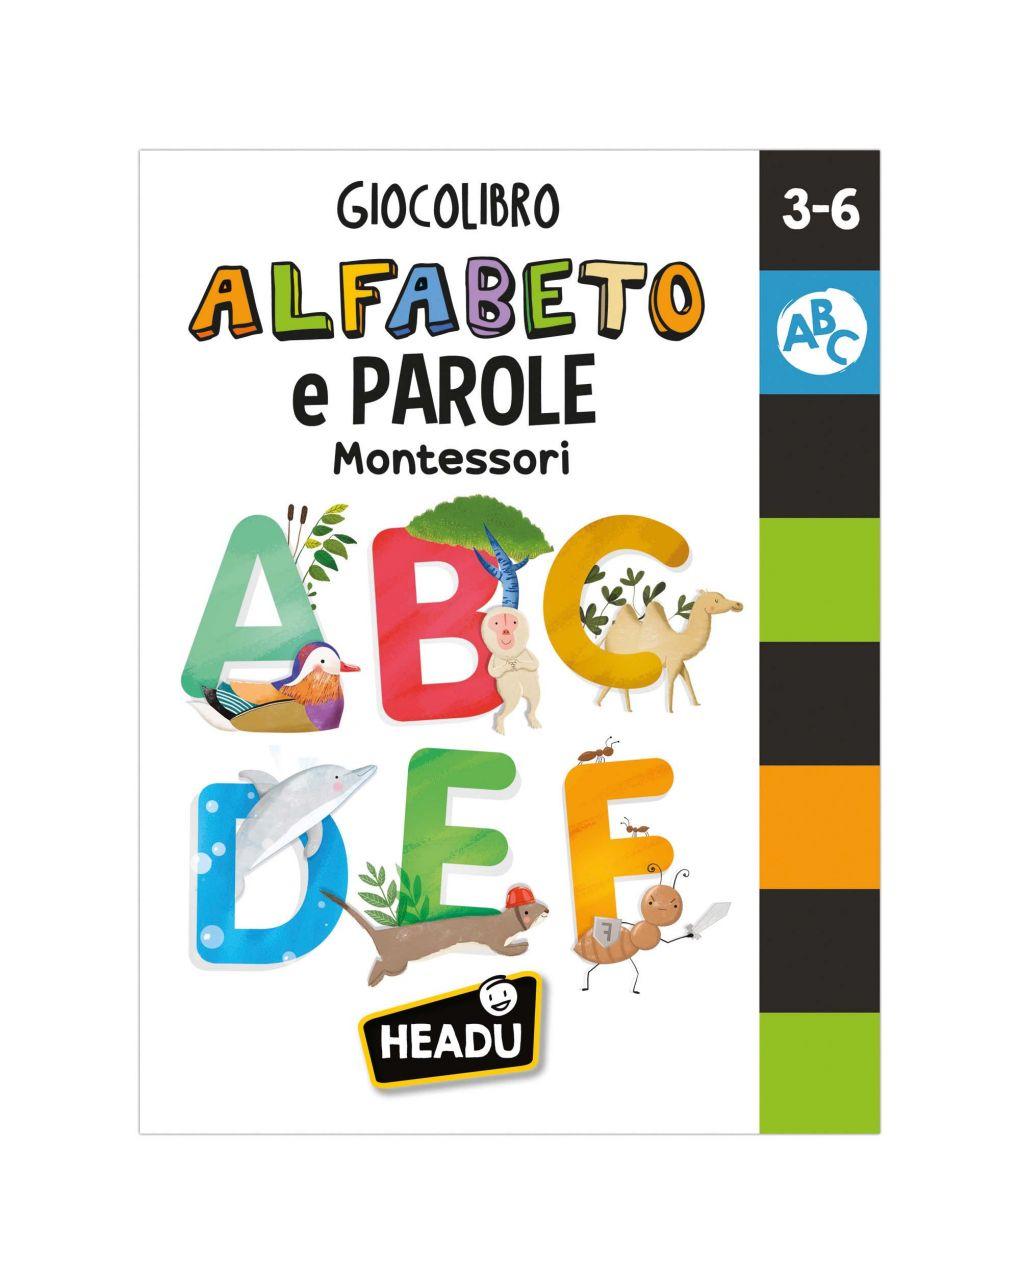 Headu - giocolibro alfabeto e parole montessori - Headu